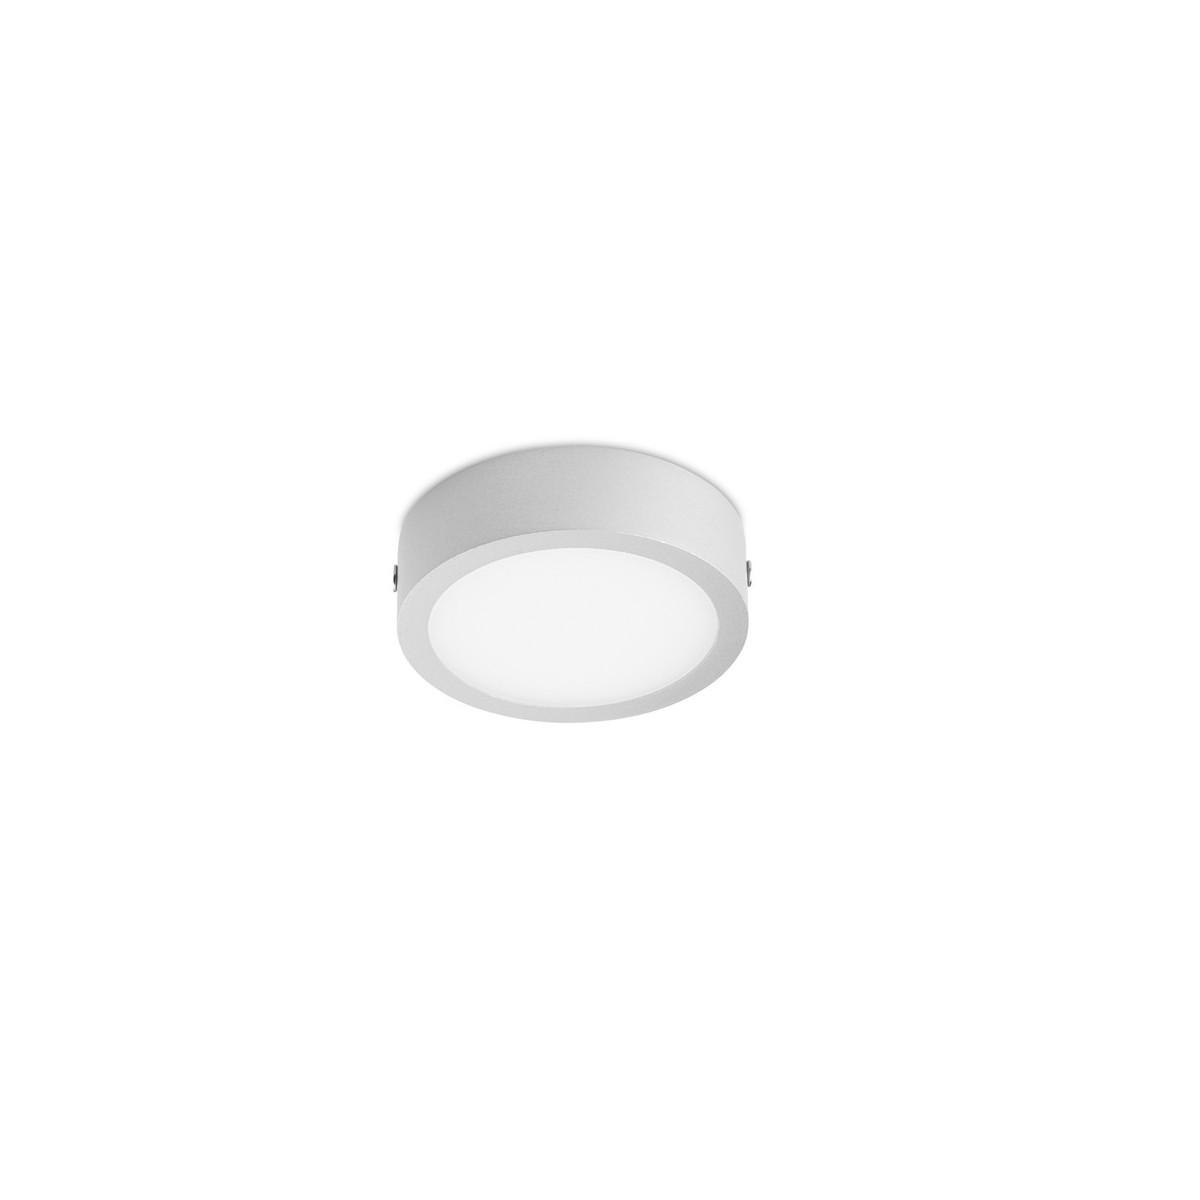 Downlight LED de superfie 8W 3000K Kaju gris